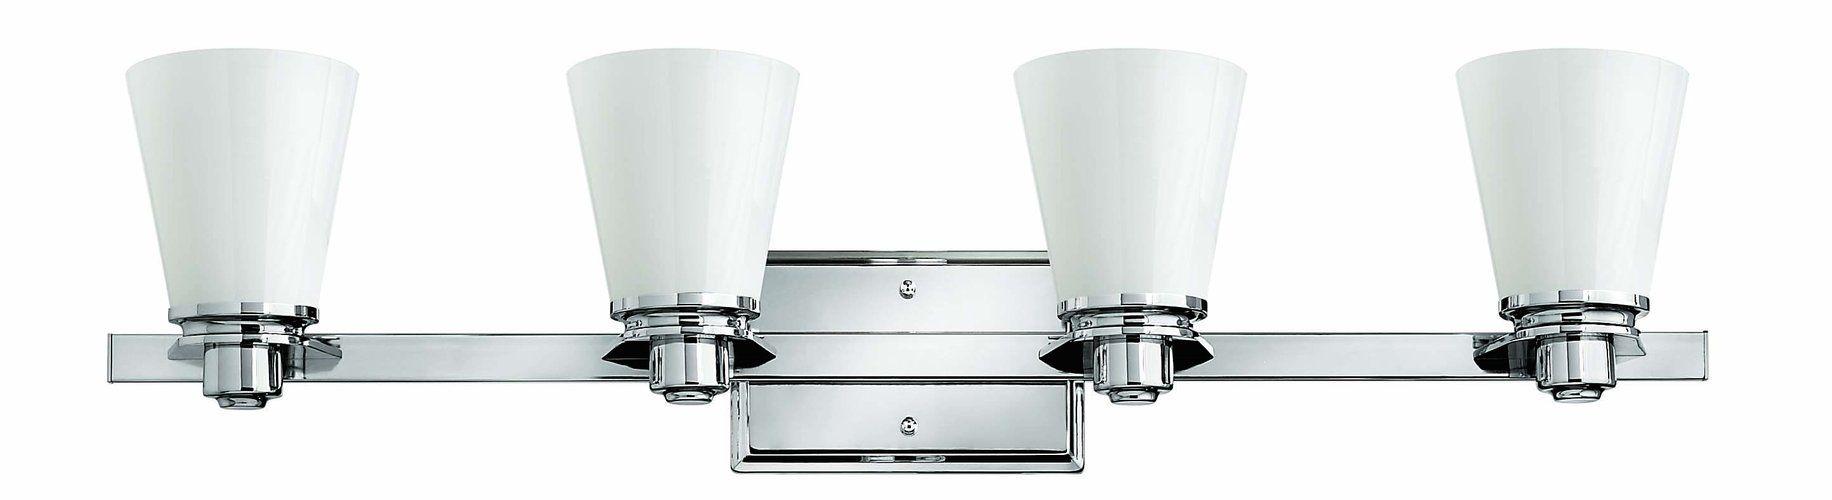 Chrome Bathroom Lighting Collections | Hinkley Lighting 5556cm Chrome Avon  48 Modern 6 Light Bathroom Fixture